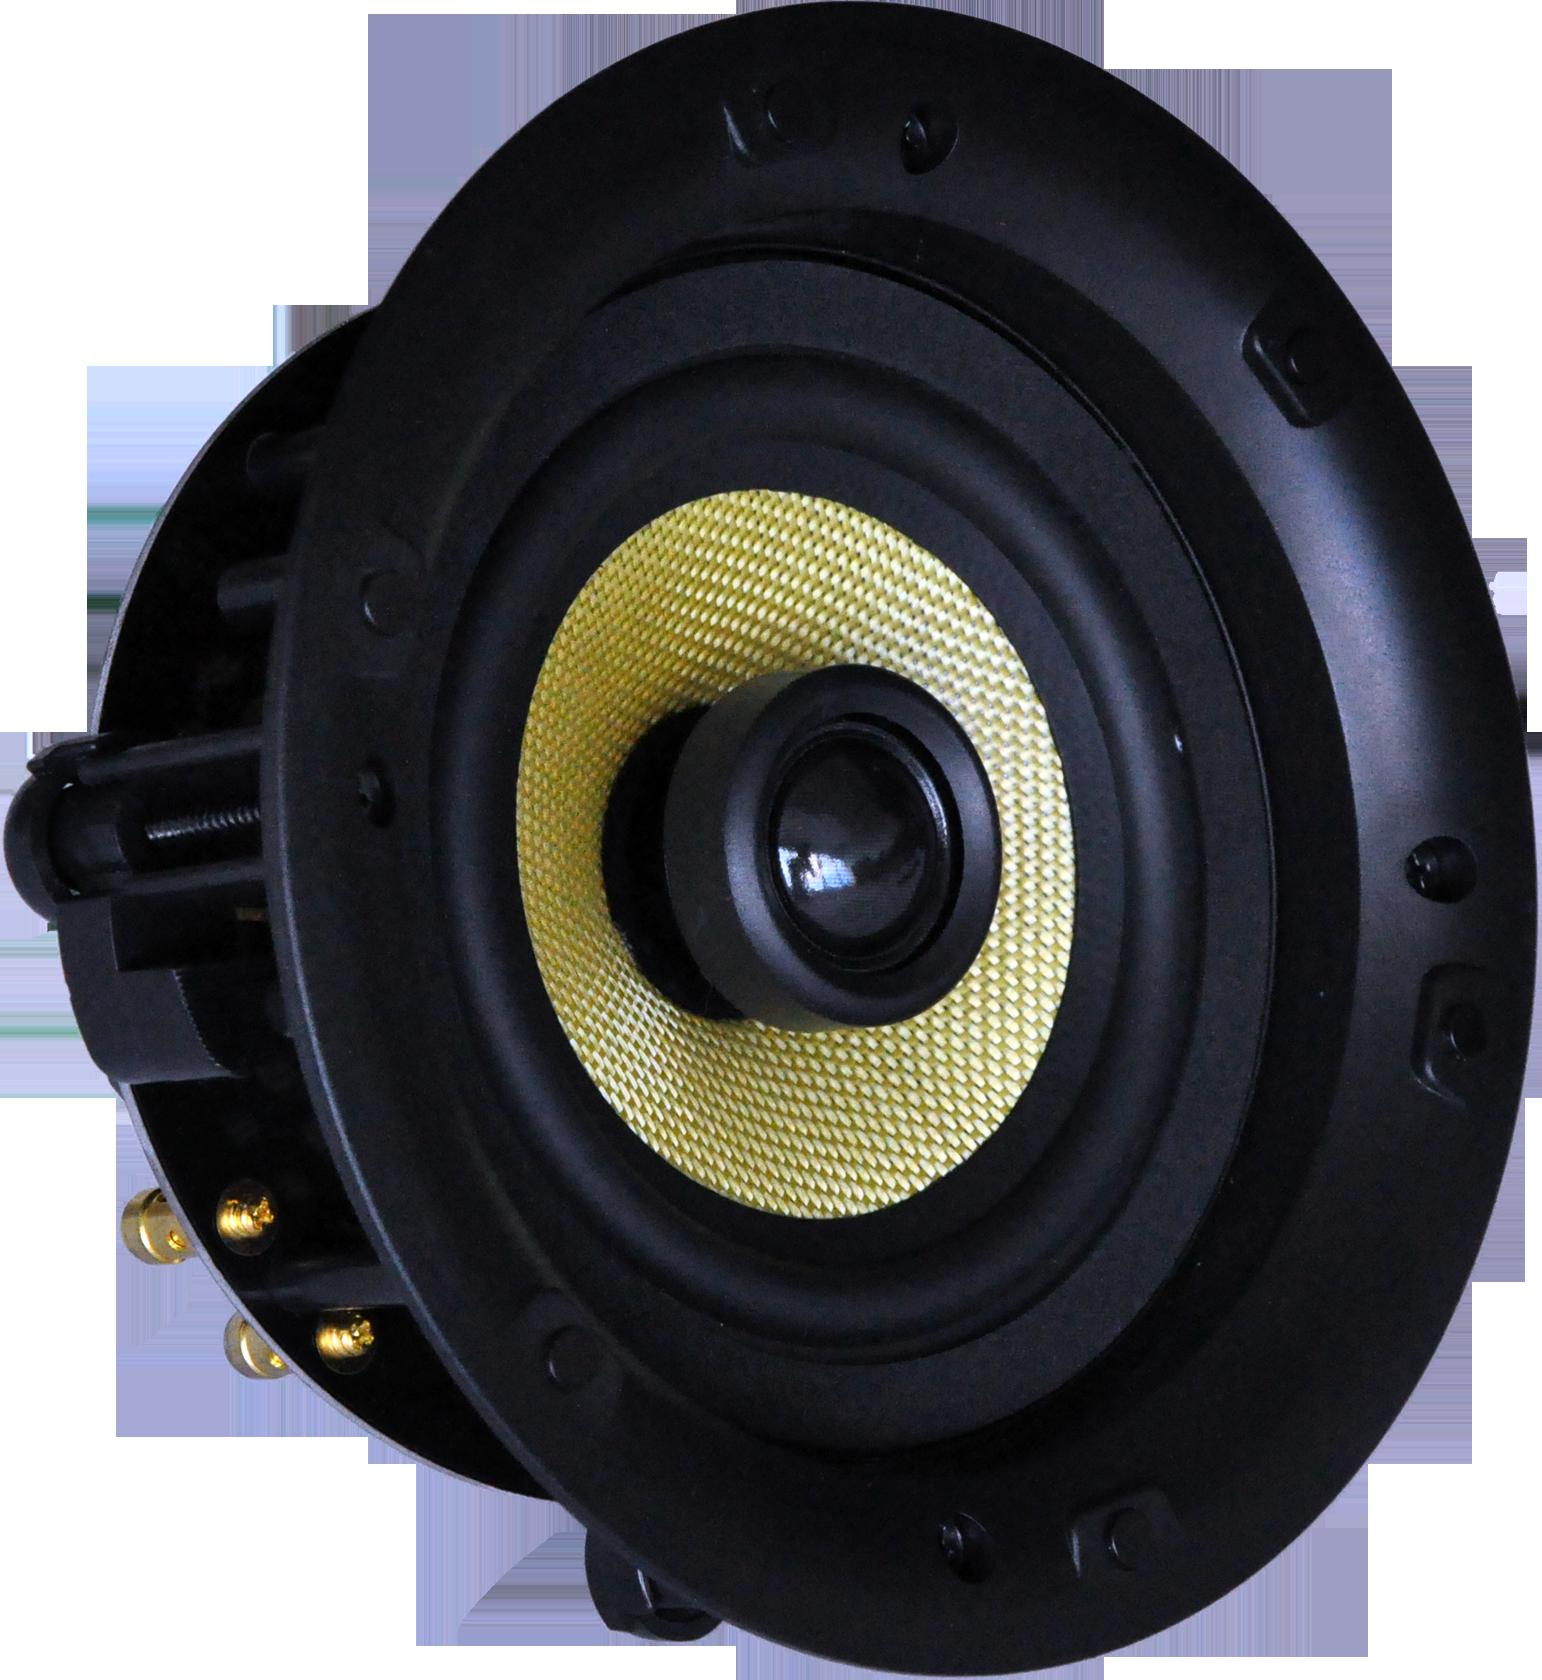 Bocina Bluetooth WiPLAY550